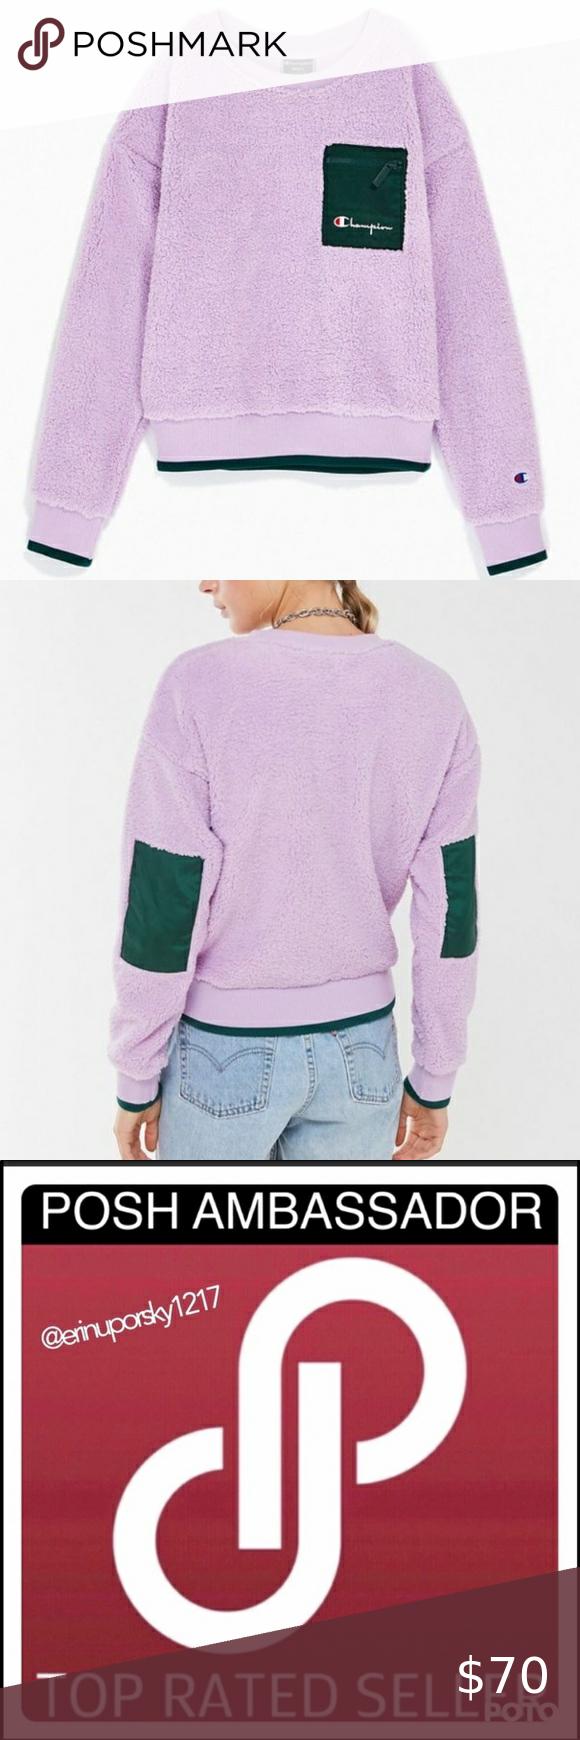 Vintage Details Nwt Rare Champion Uo Exclusive Nwt Neck Designs Clothes Design Sweatshirt Tops [ 1740 x 580 Pixel ]